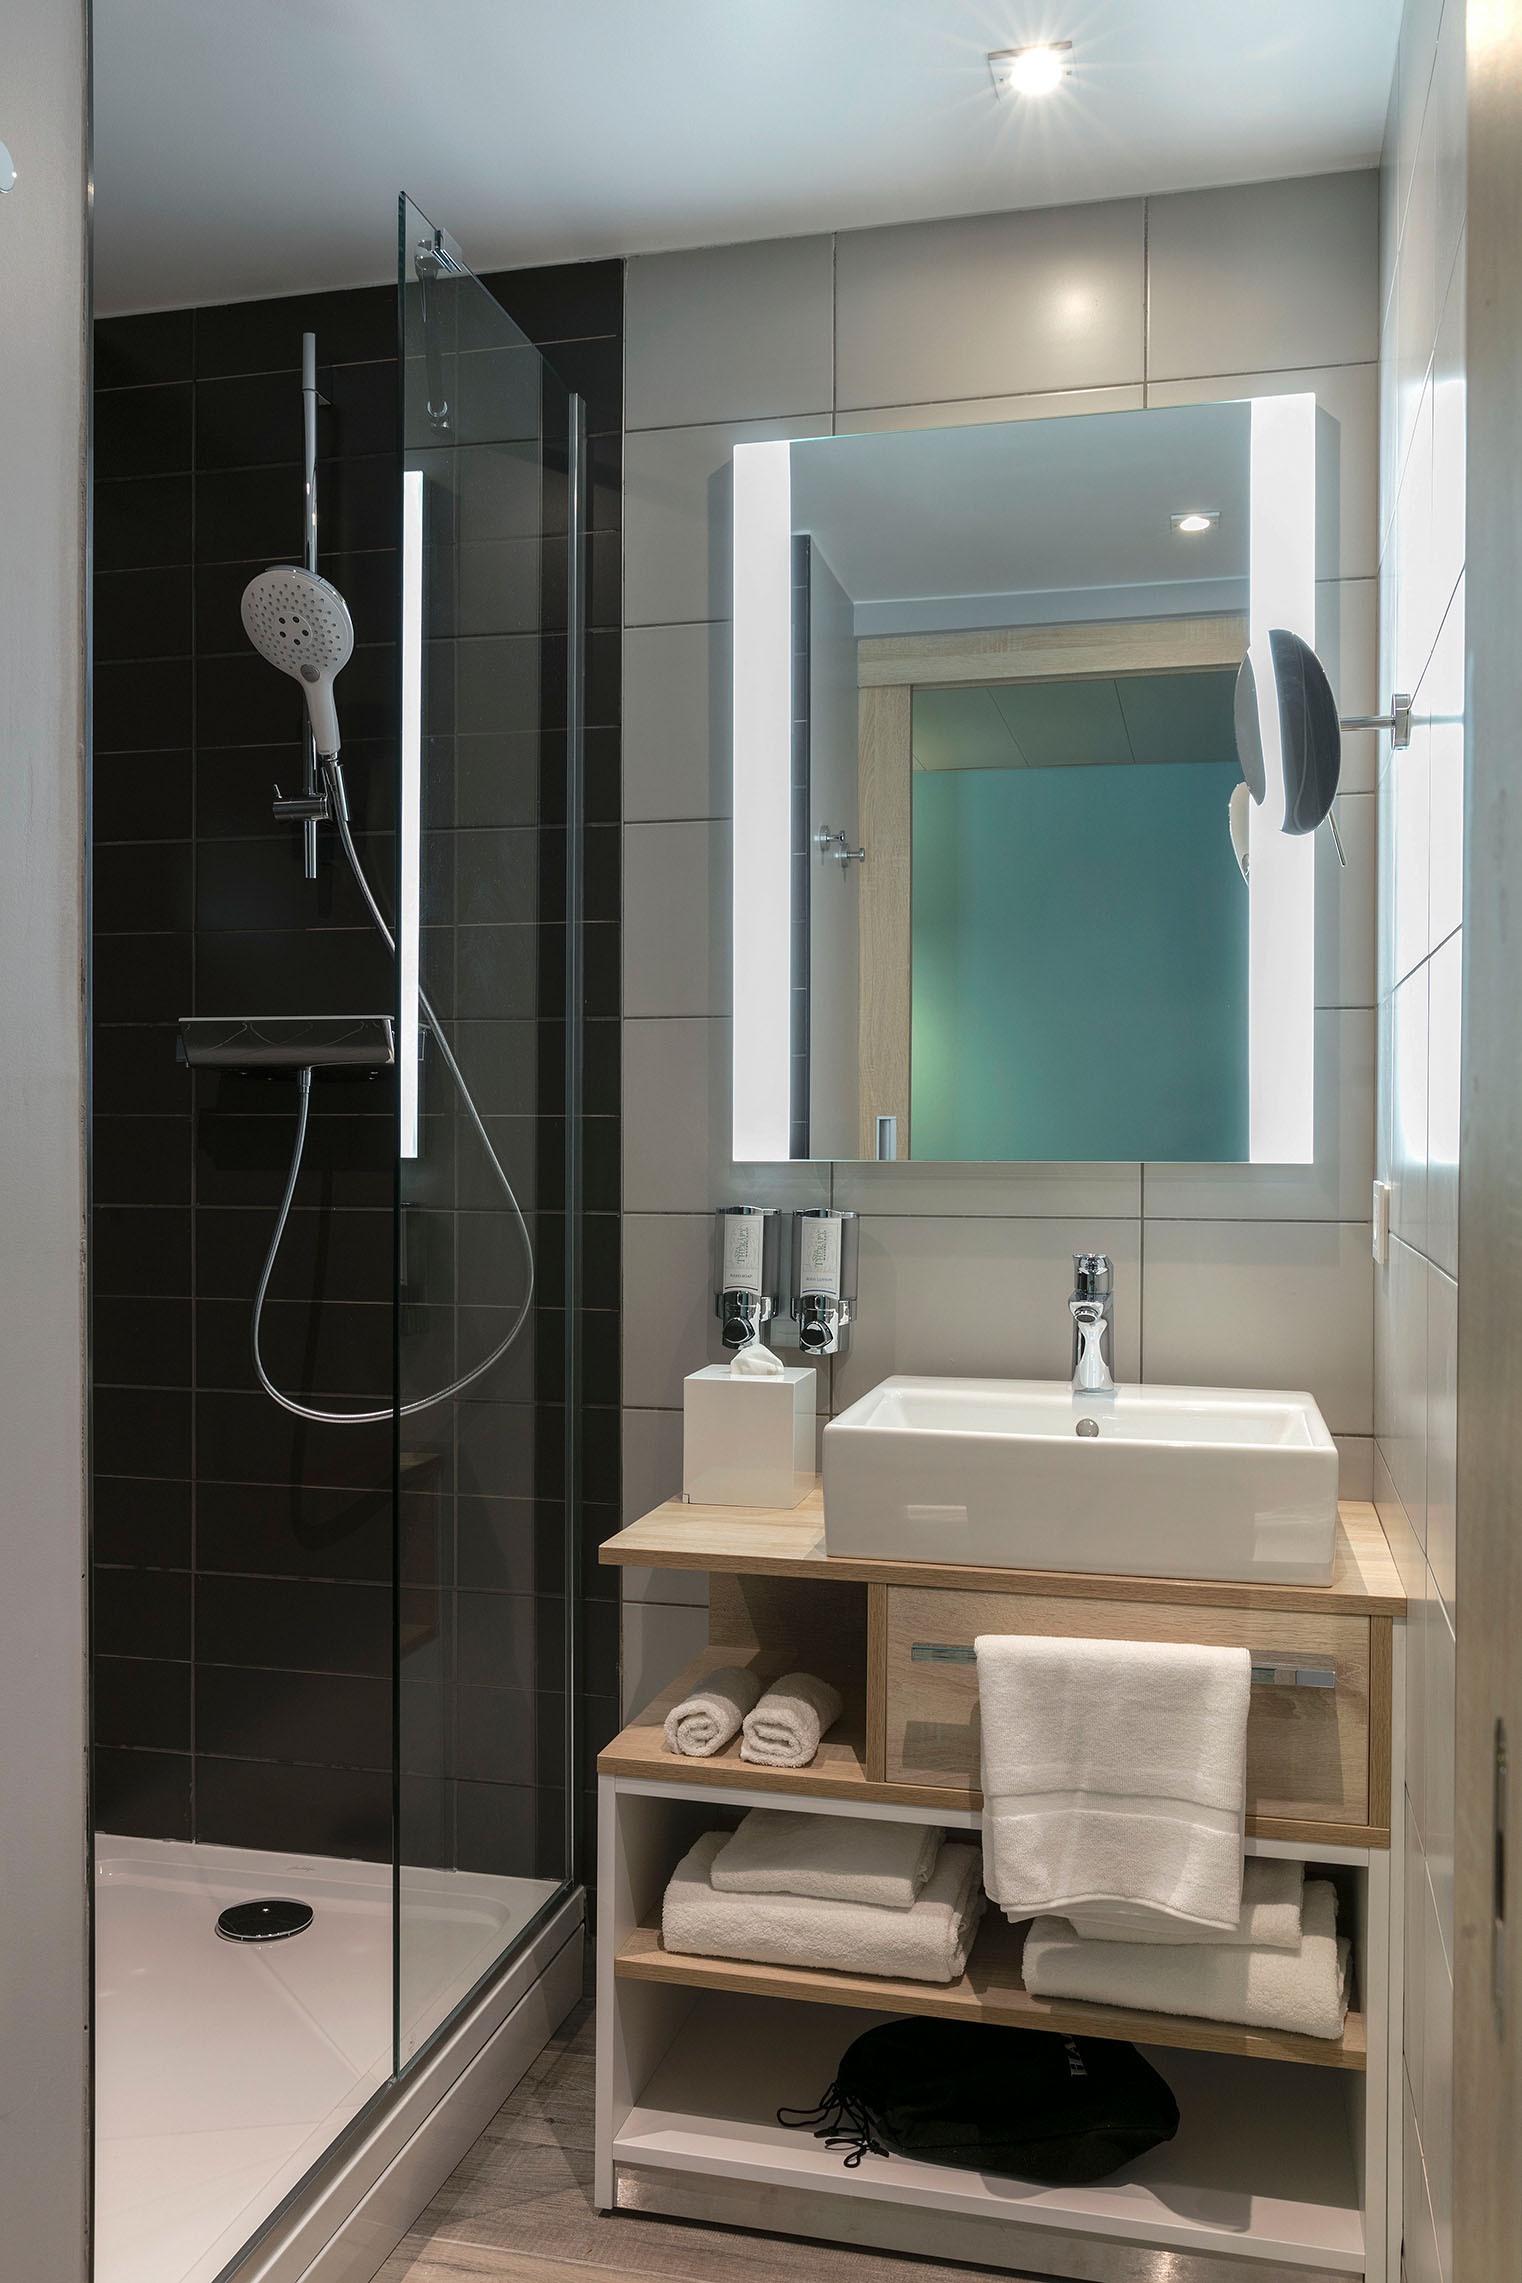 hampton-by-hilton-paris-clichy-chambre-standard-salle-de-bain-1